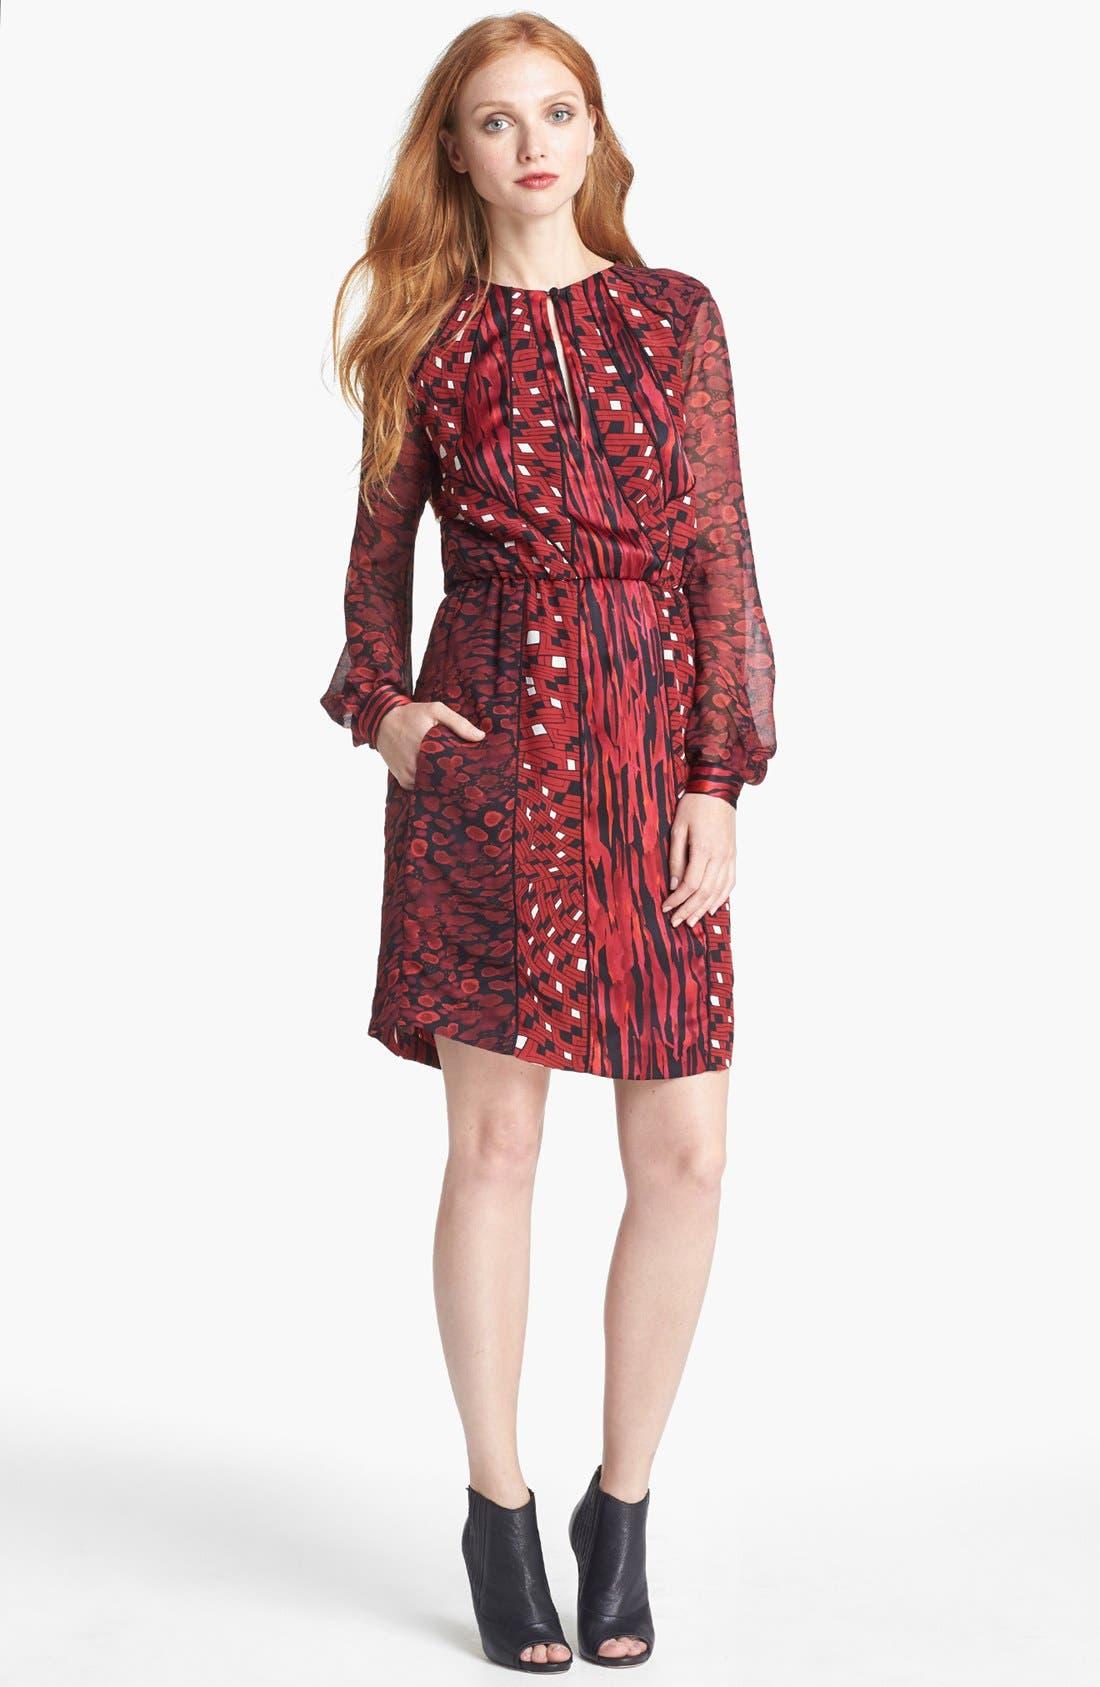 Alternate Image 1 Selected - Diane von Furstenberg 'Kit' Print Silk Blouson Dress